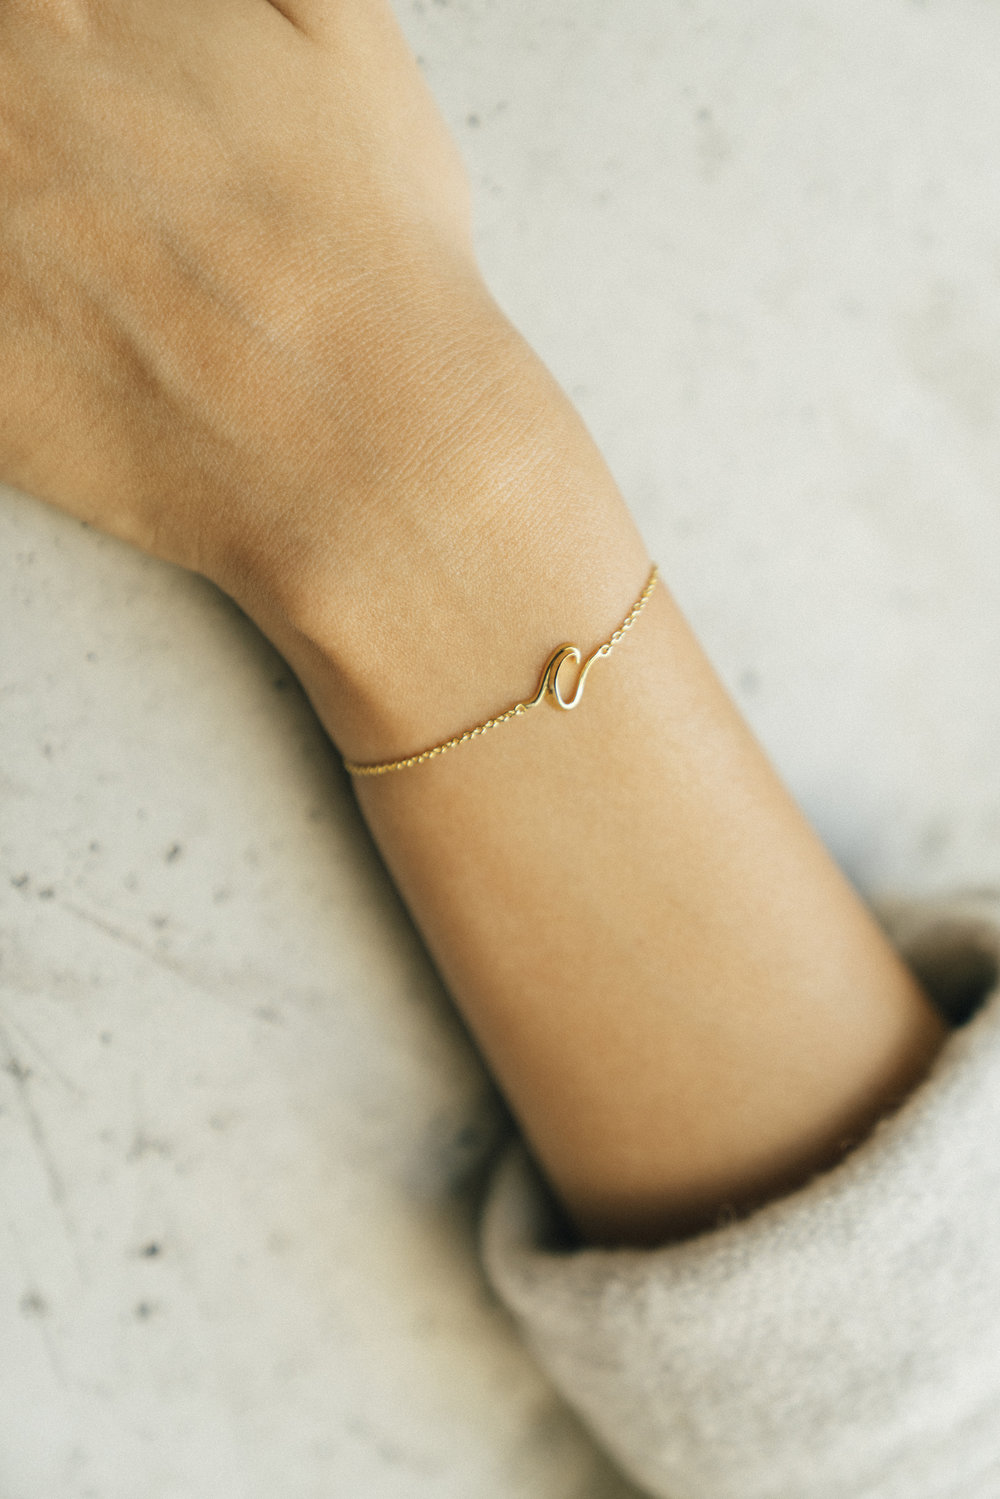 hey-yeh-joyce-chiang-calligraphy-bracelet-02.jpg